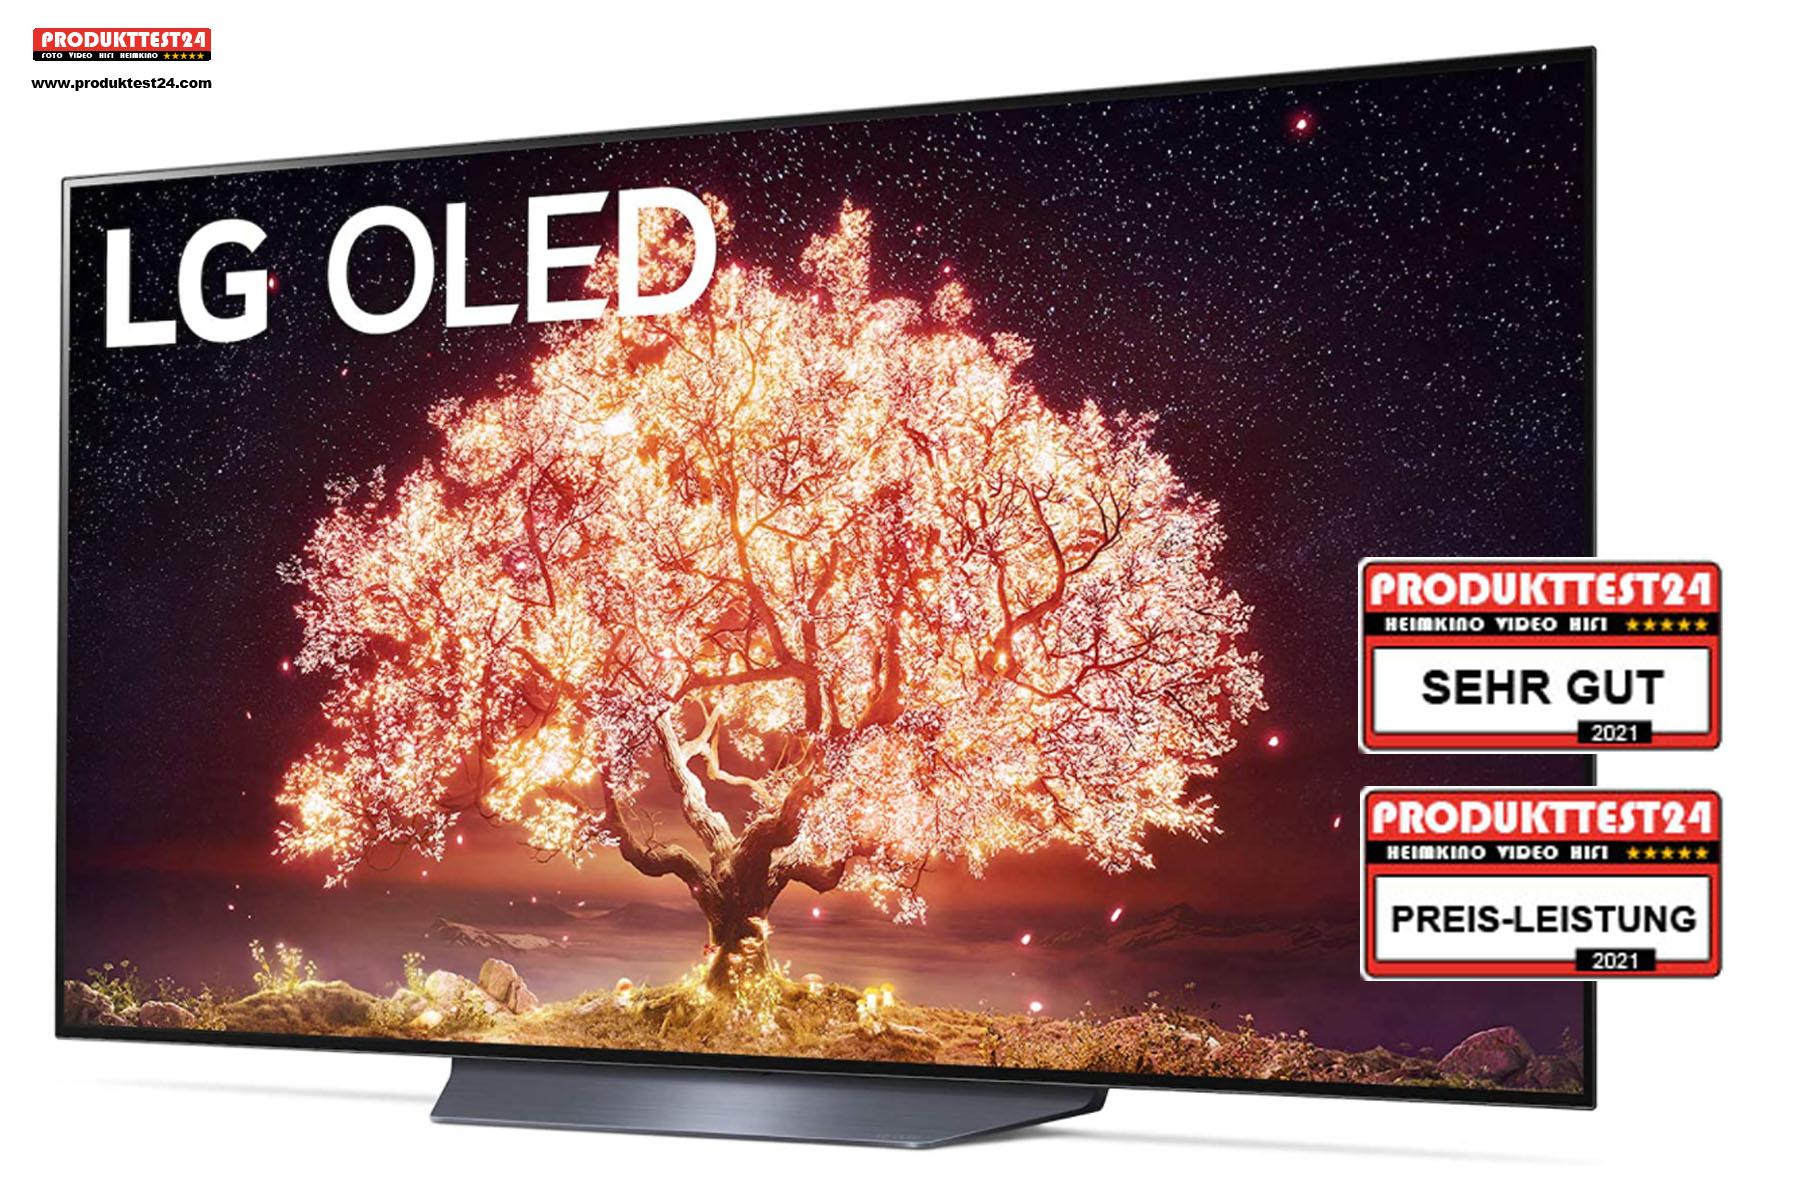 LG OLED65B19LA OLED 4K-Fernseher - Testurteil: SEHR GUT